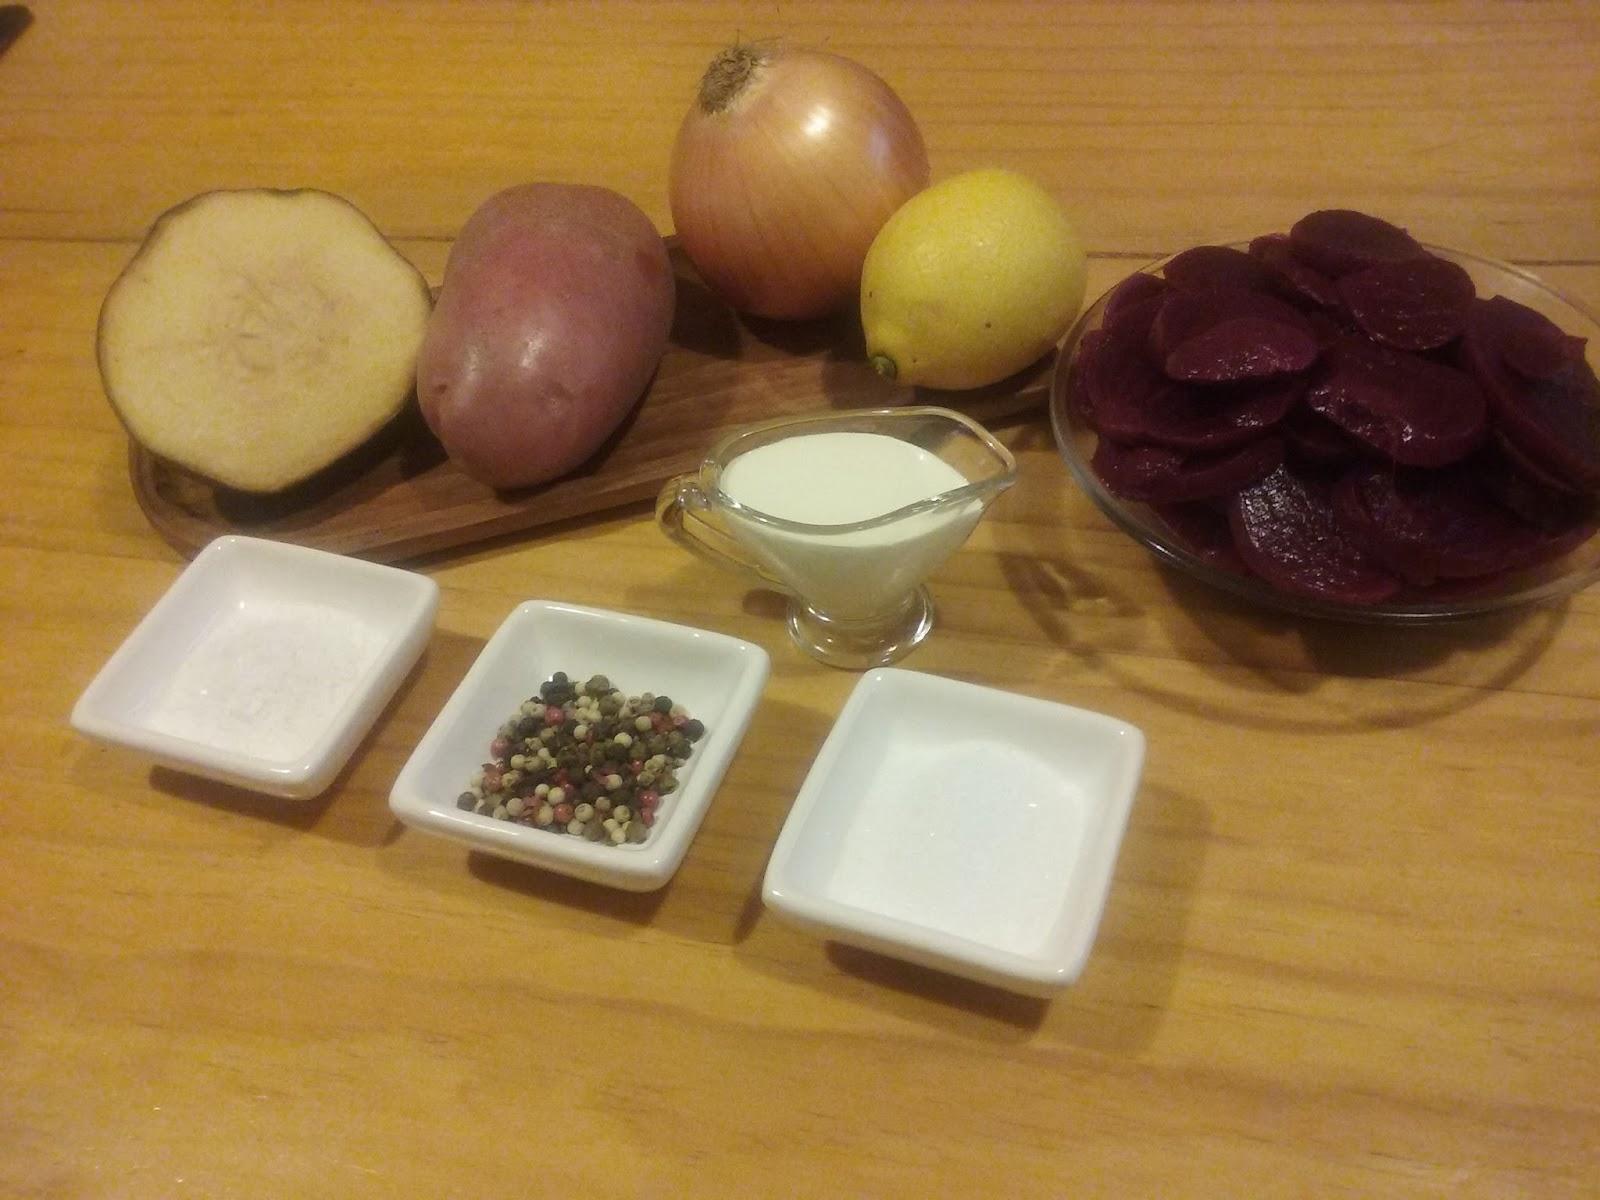 La cocina de celuloide for Cocina 5 ingredientes jamie